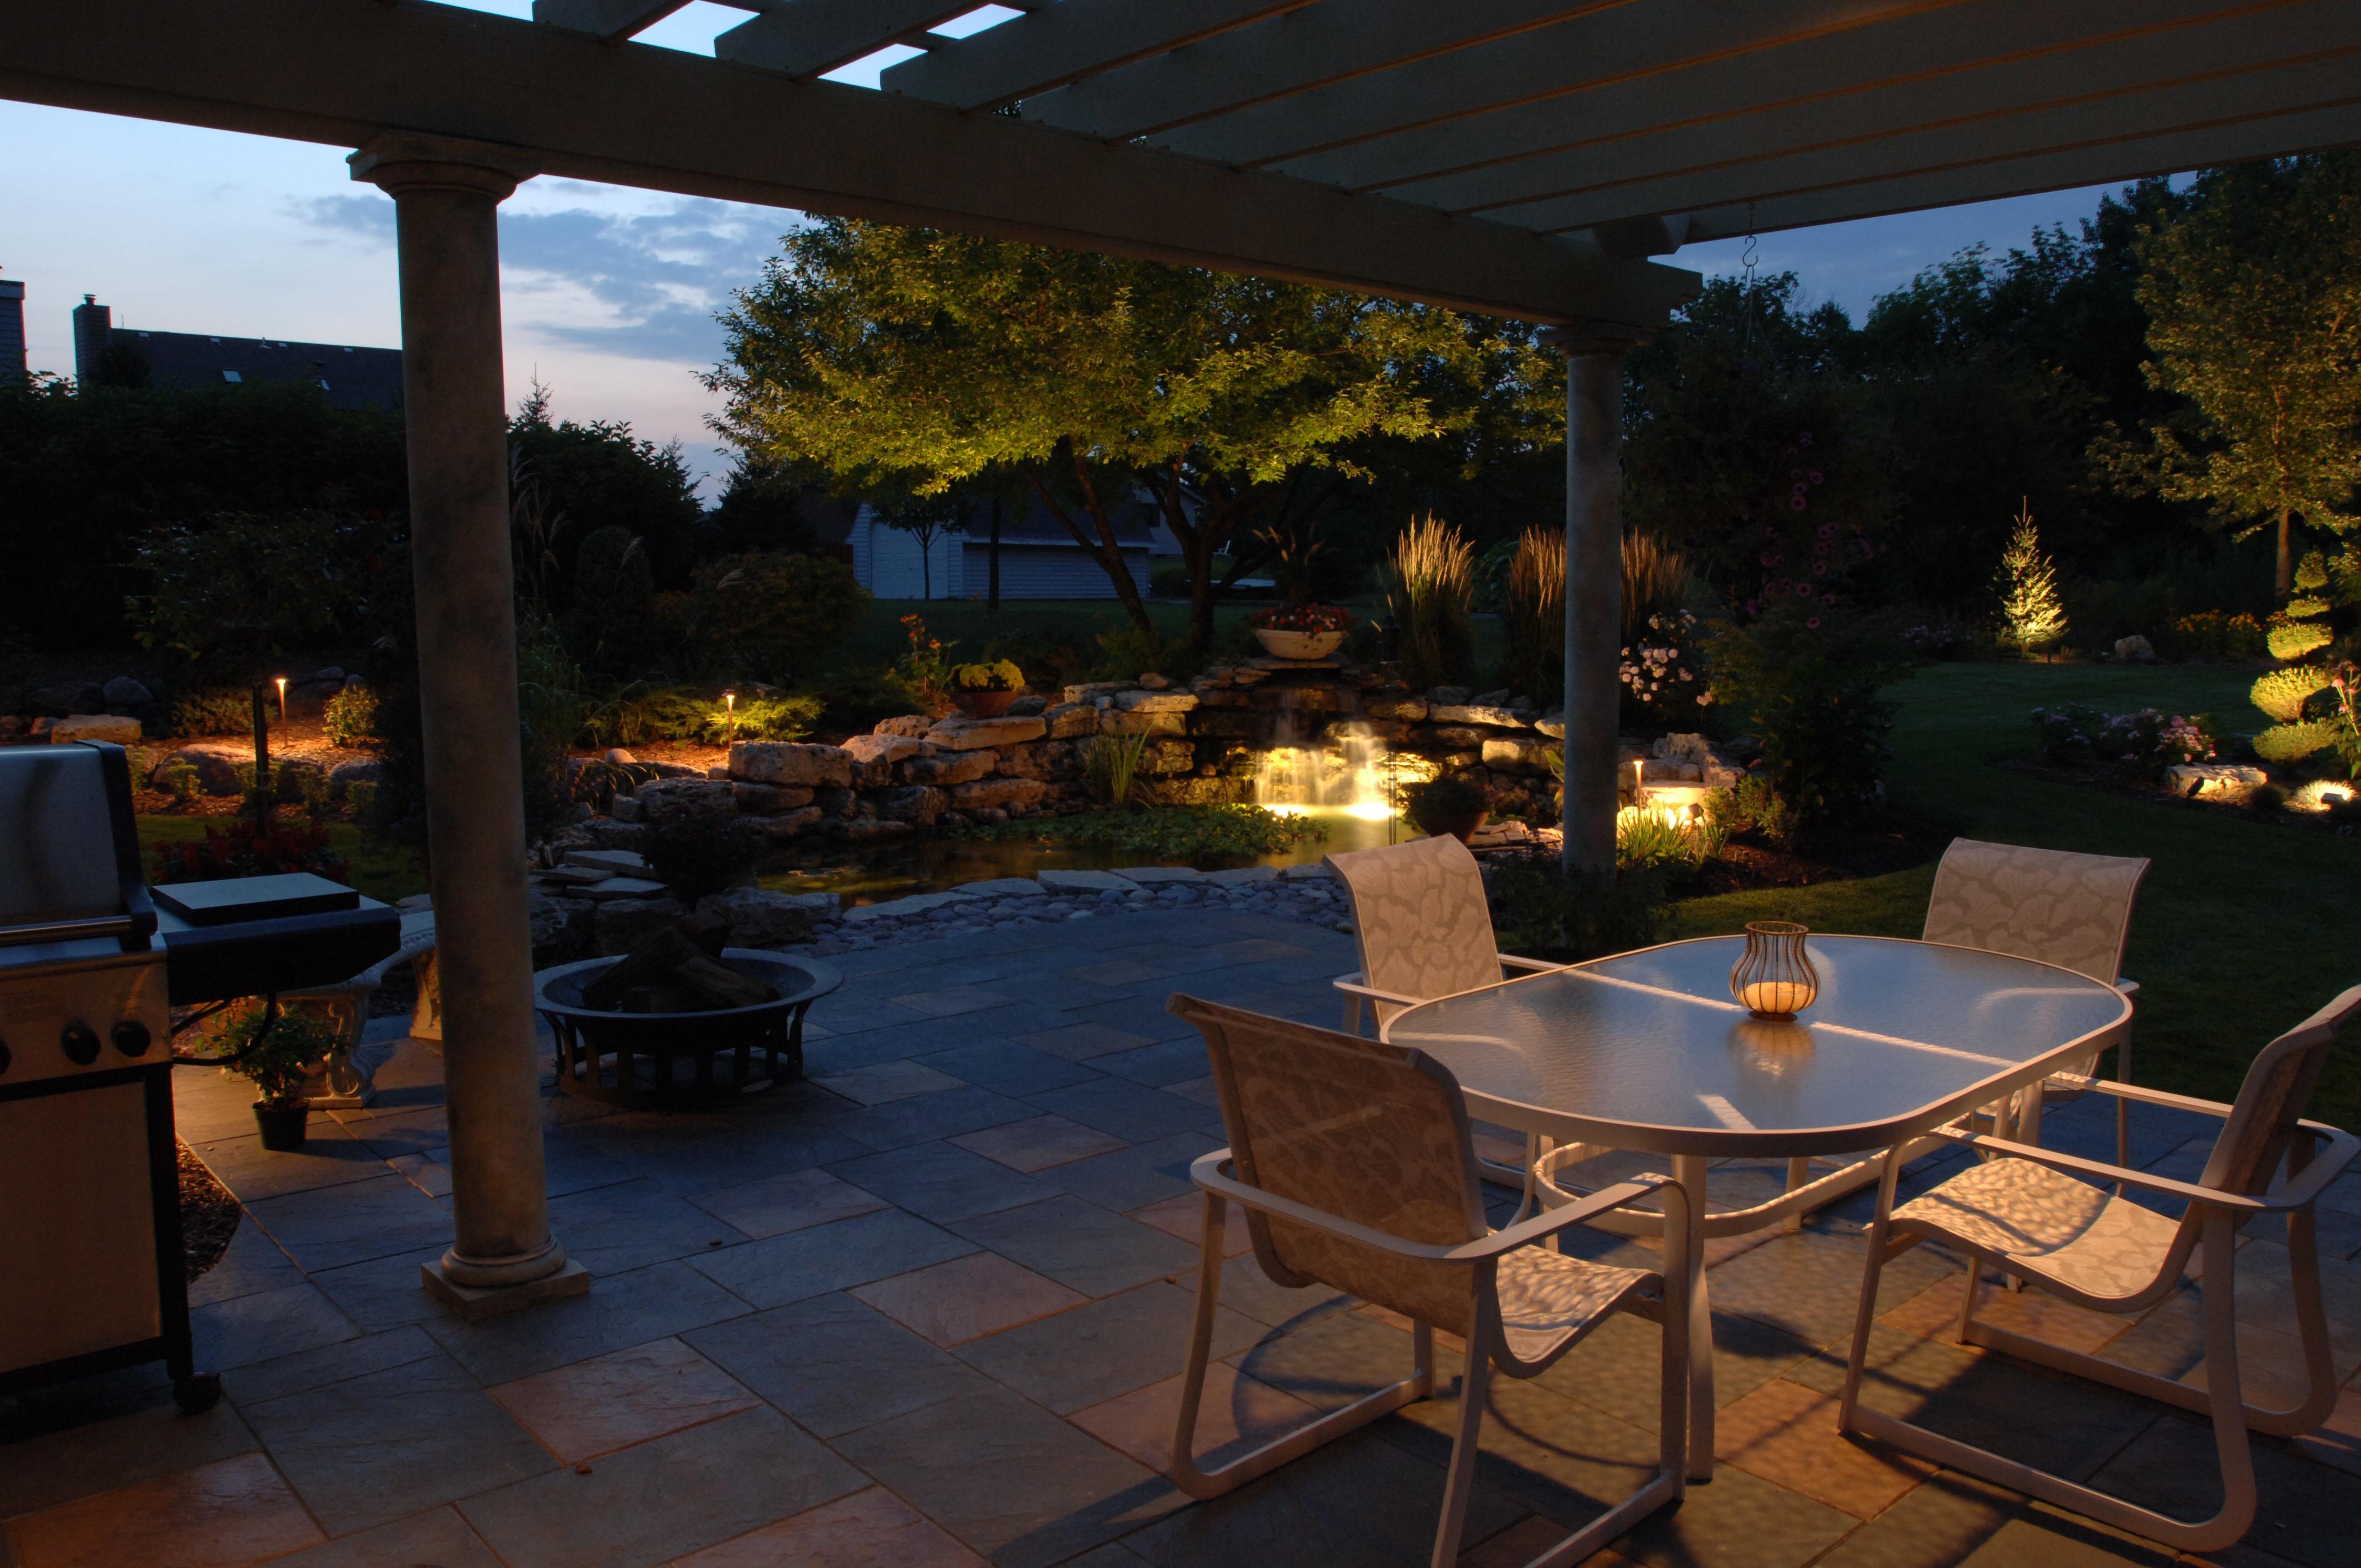 Gino_Patio_Outdoor_Lighting_Porch_Deck_Kitchen_World_Class_Outdoor_Lighting.jpg